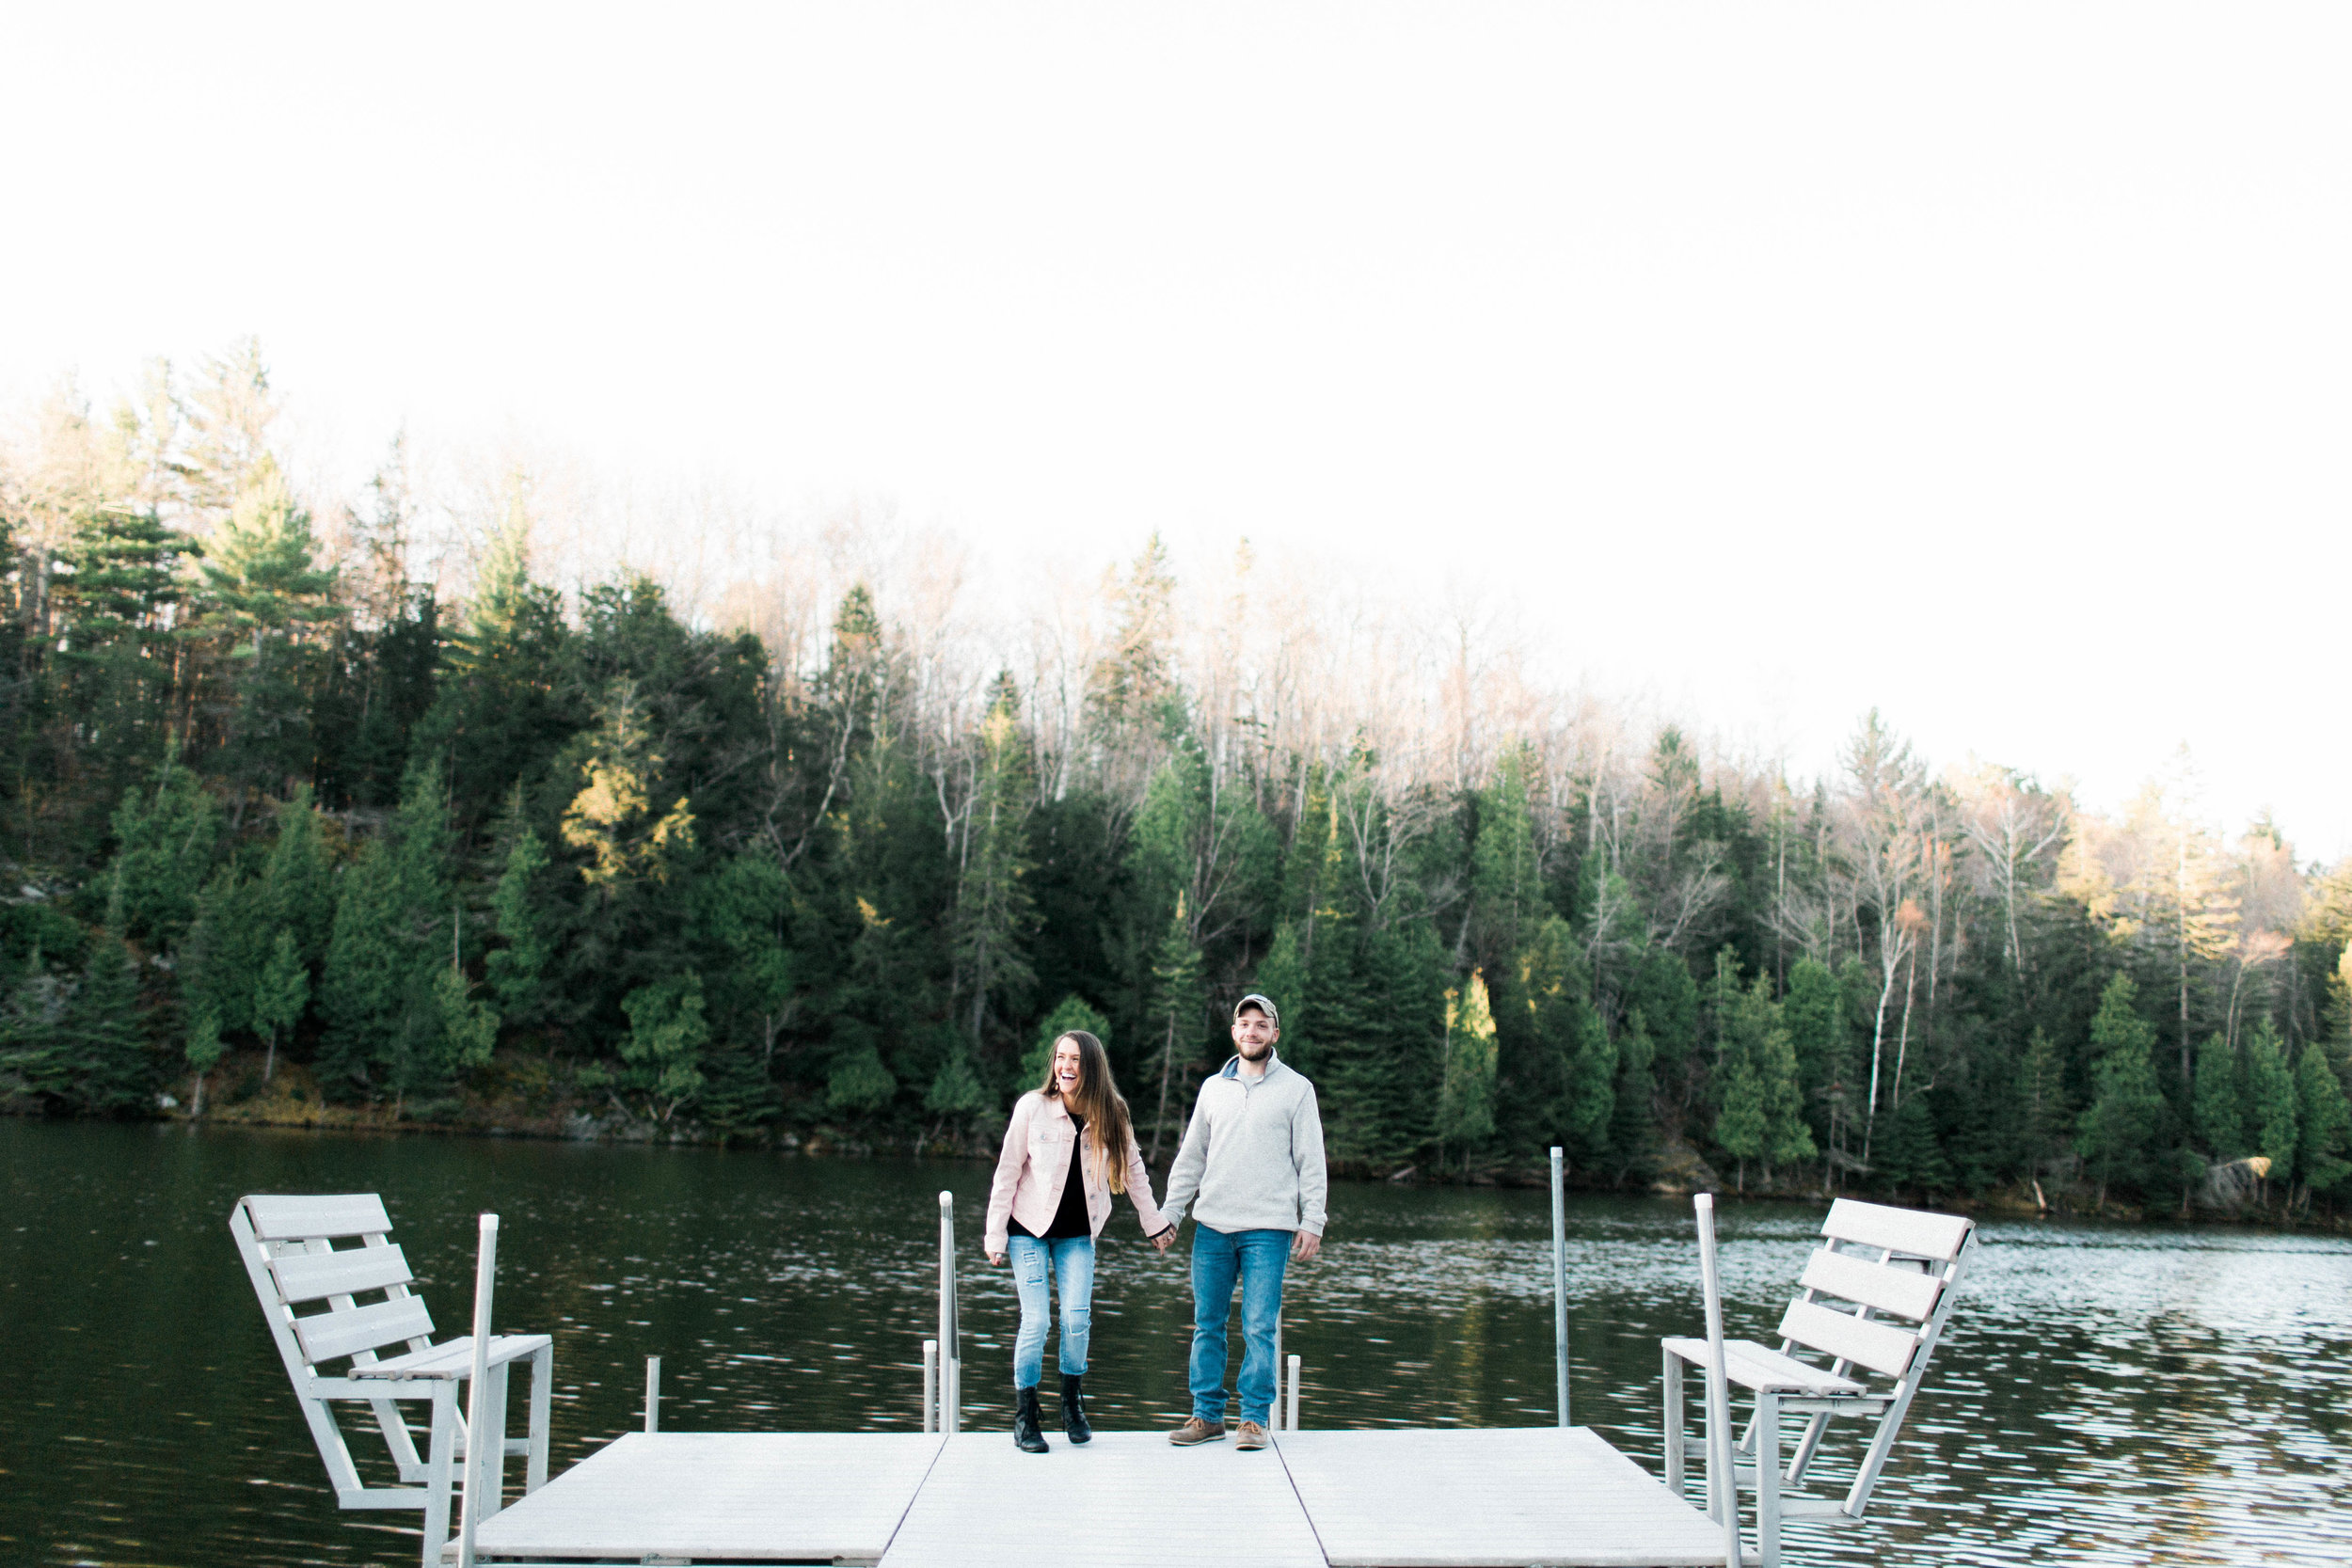 Horse Farm Engagment - Sabrina Leigh Studios - Northern Michigan Wedding Photographer 04.jpg